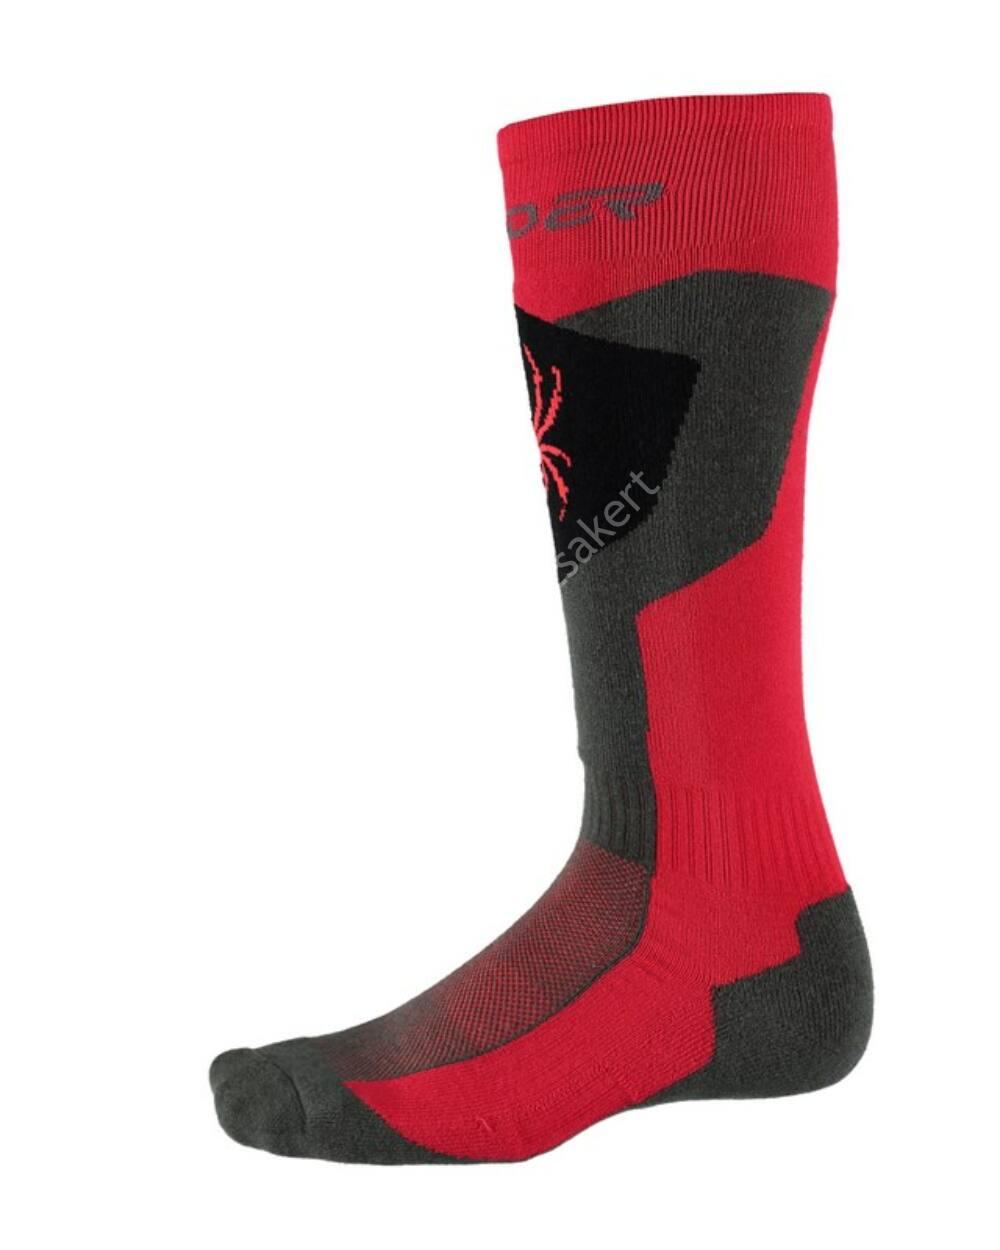 Spyder Discover férfi sízokni, piros/szürke/fekete, 38-41